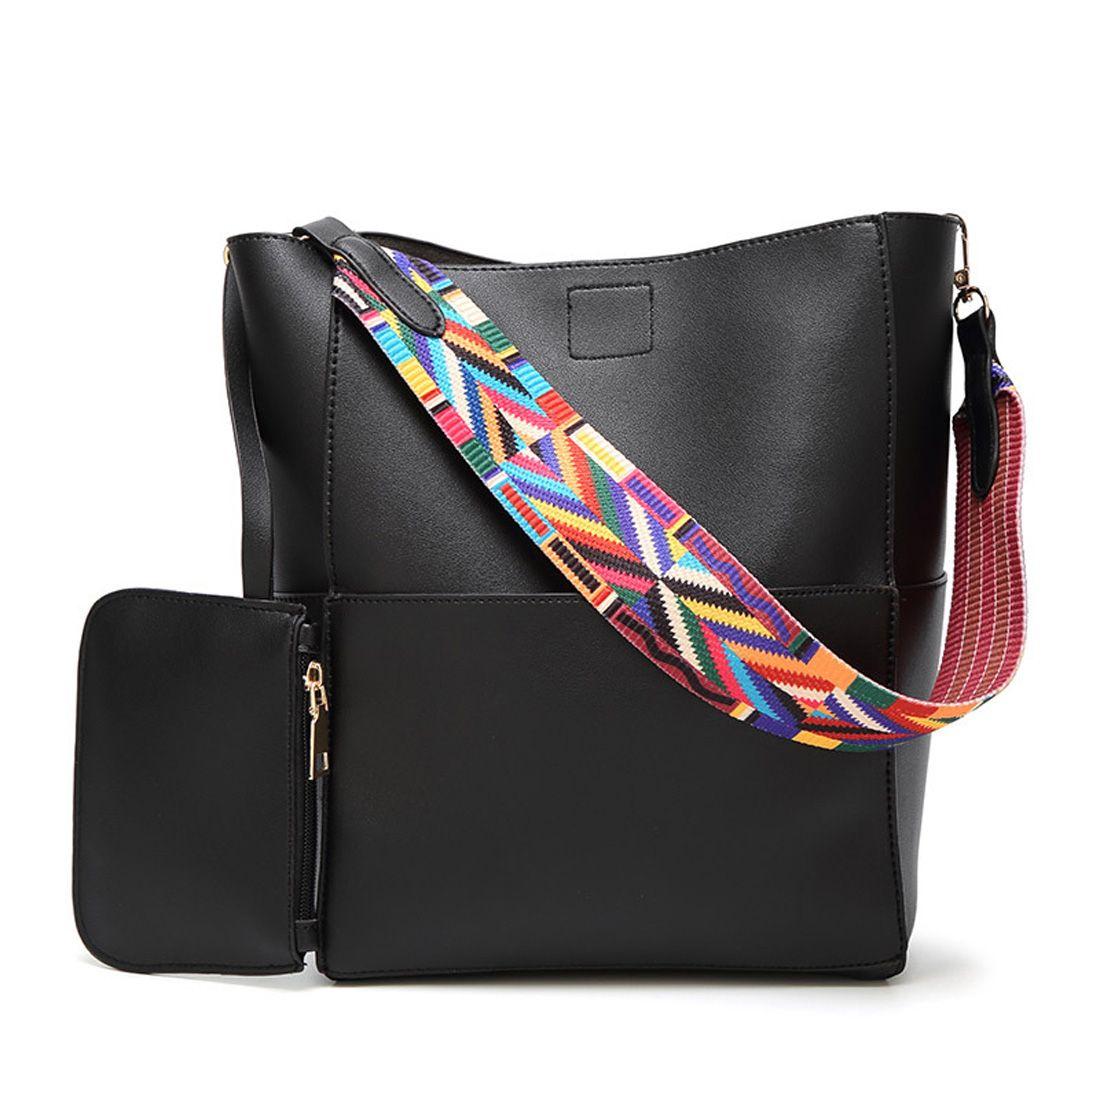 92d5db630894 Luxury Brand Designer Bucket Bag Women Leather Wide Color Strap Shoulder  Bag Handbag Large Capacity Crossbody For Shopping Crossbody Bags Messenger  Bags ...